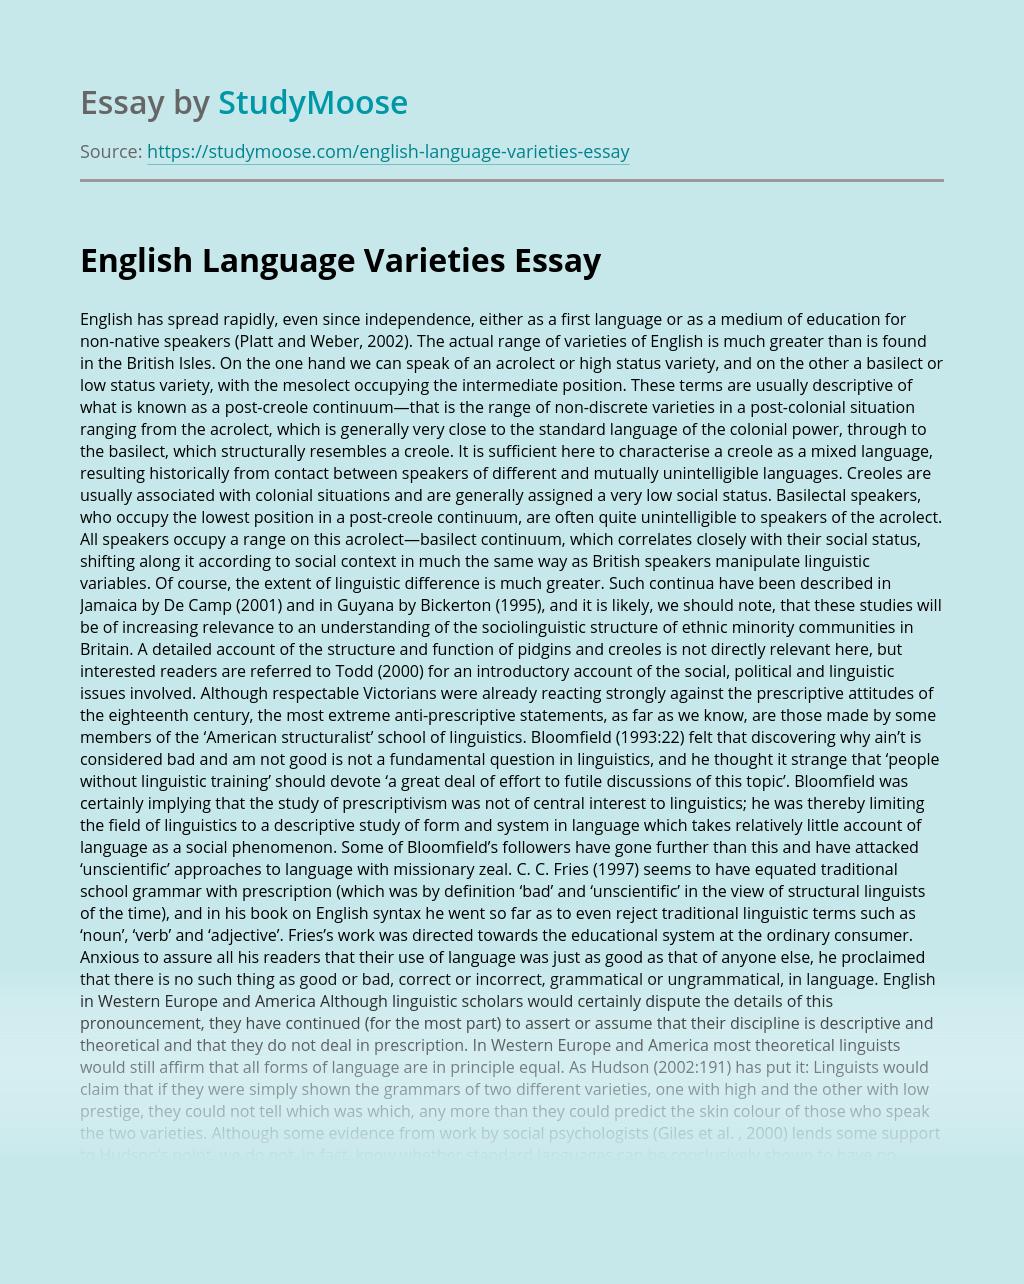 English Language Varieties